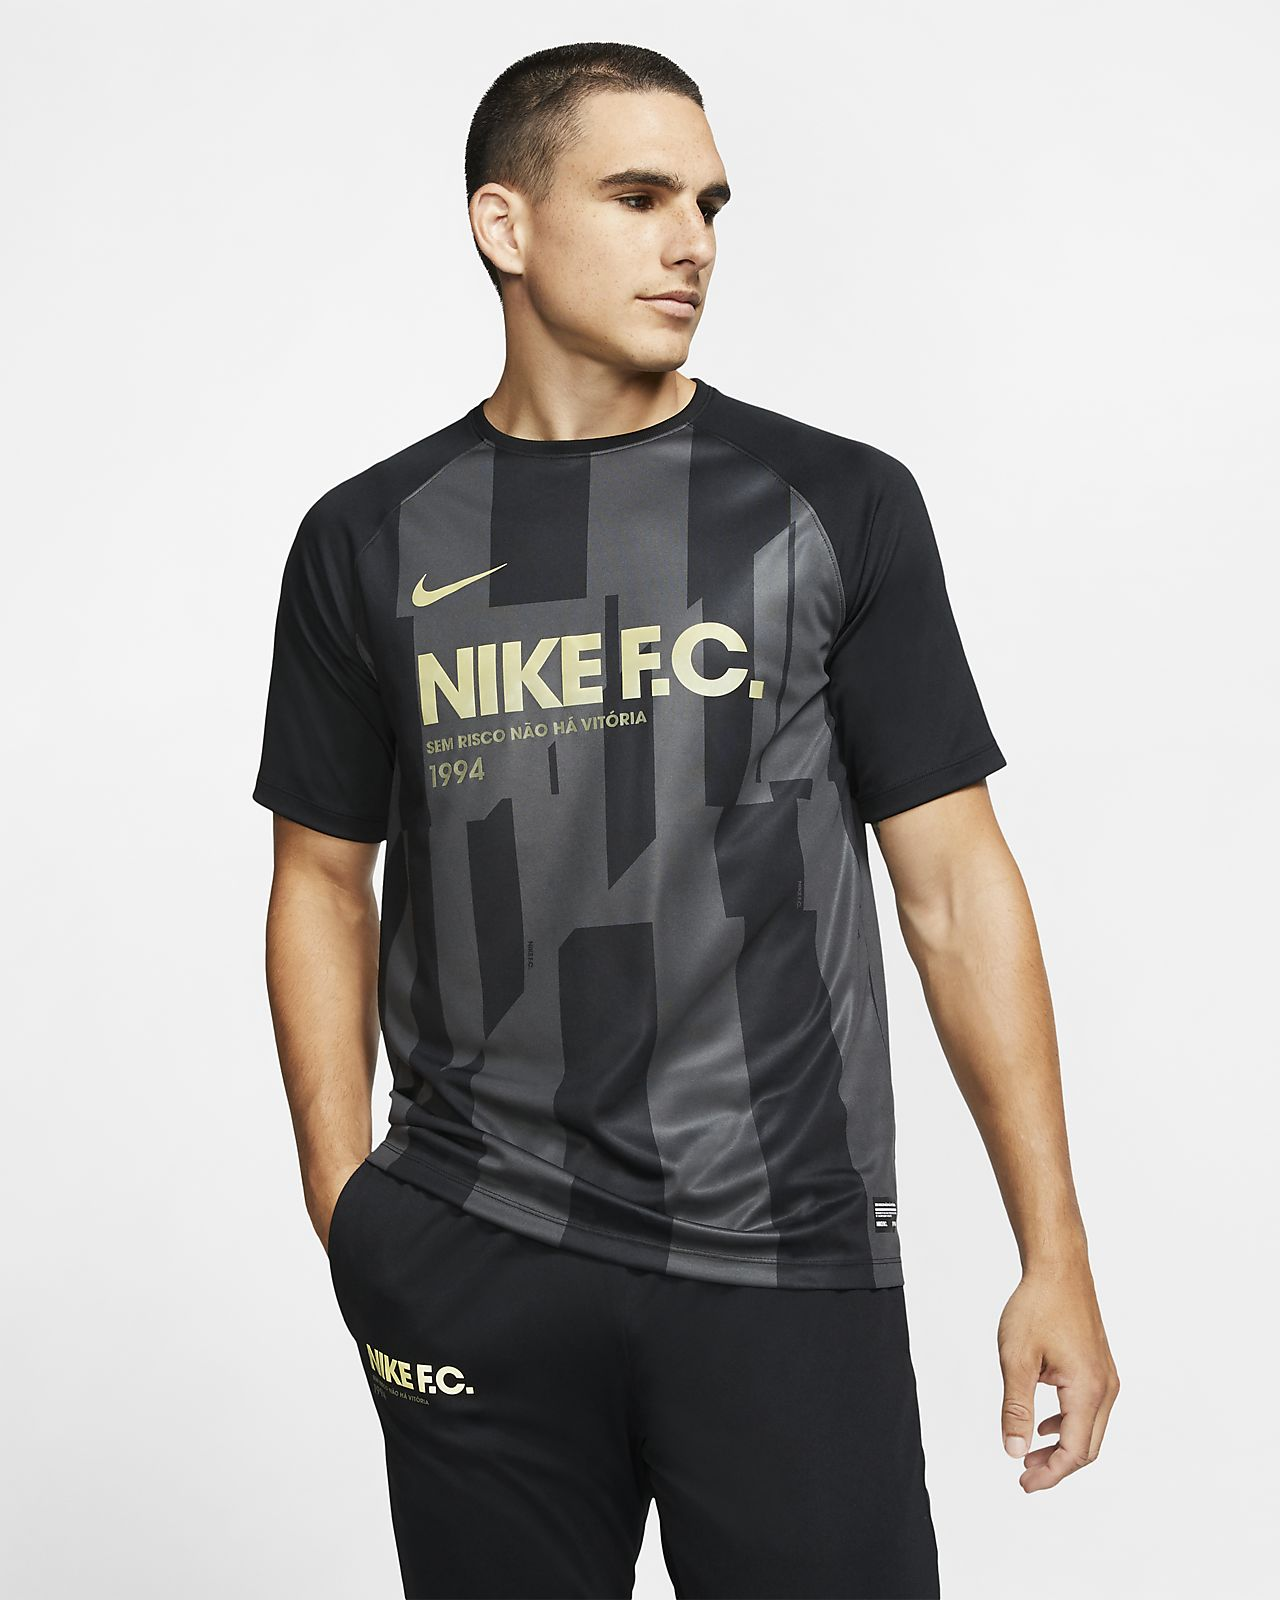 Nike F.C. Kurzarm-Trikot für Herren